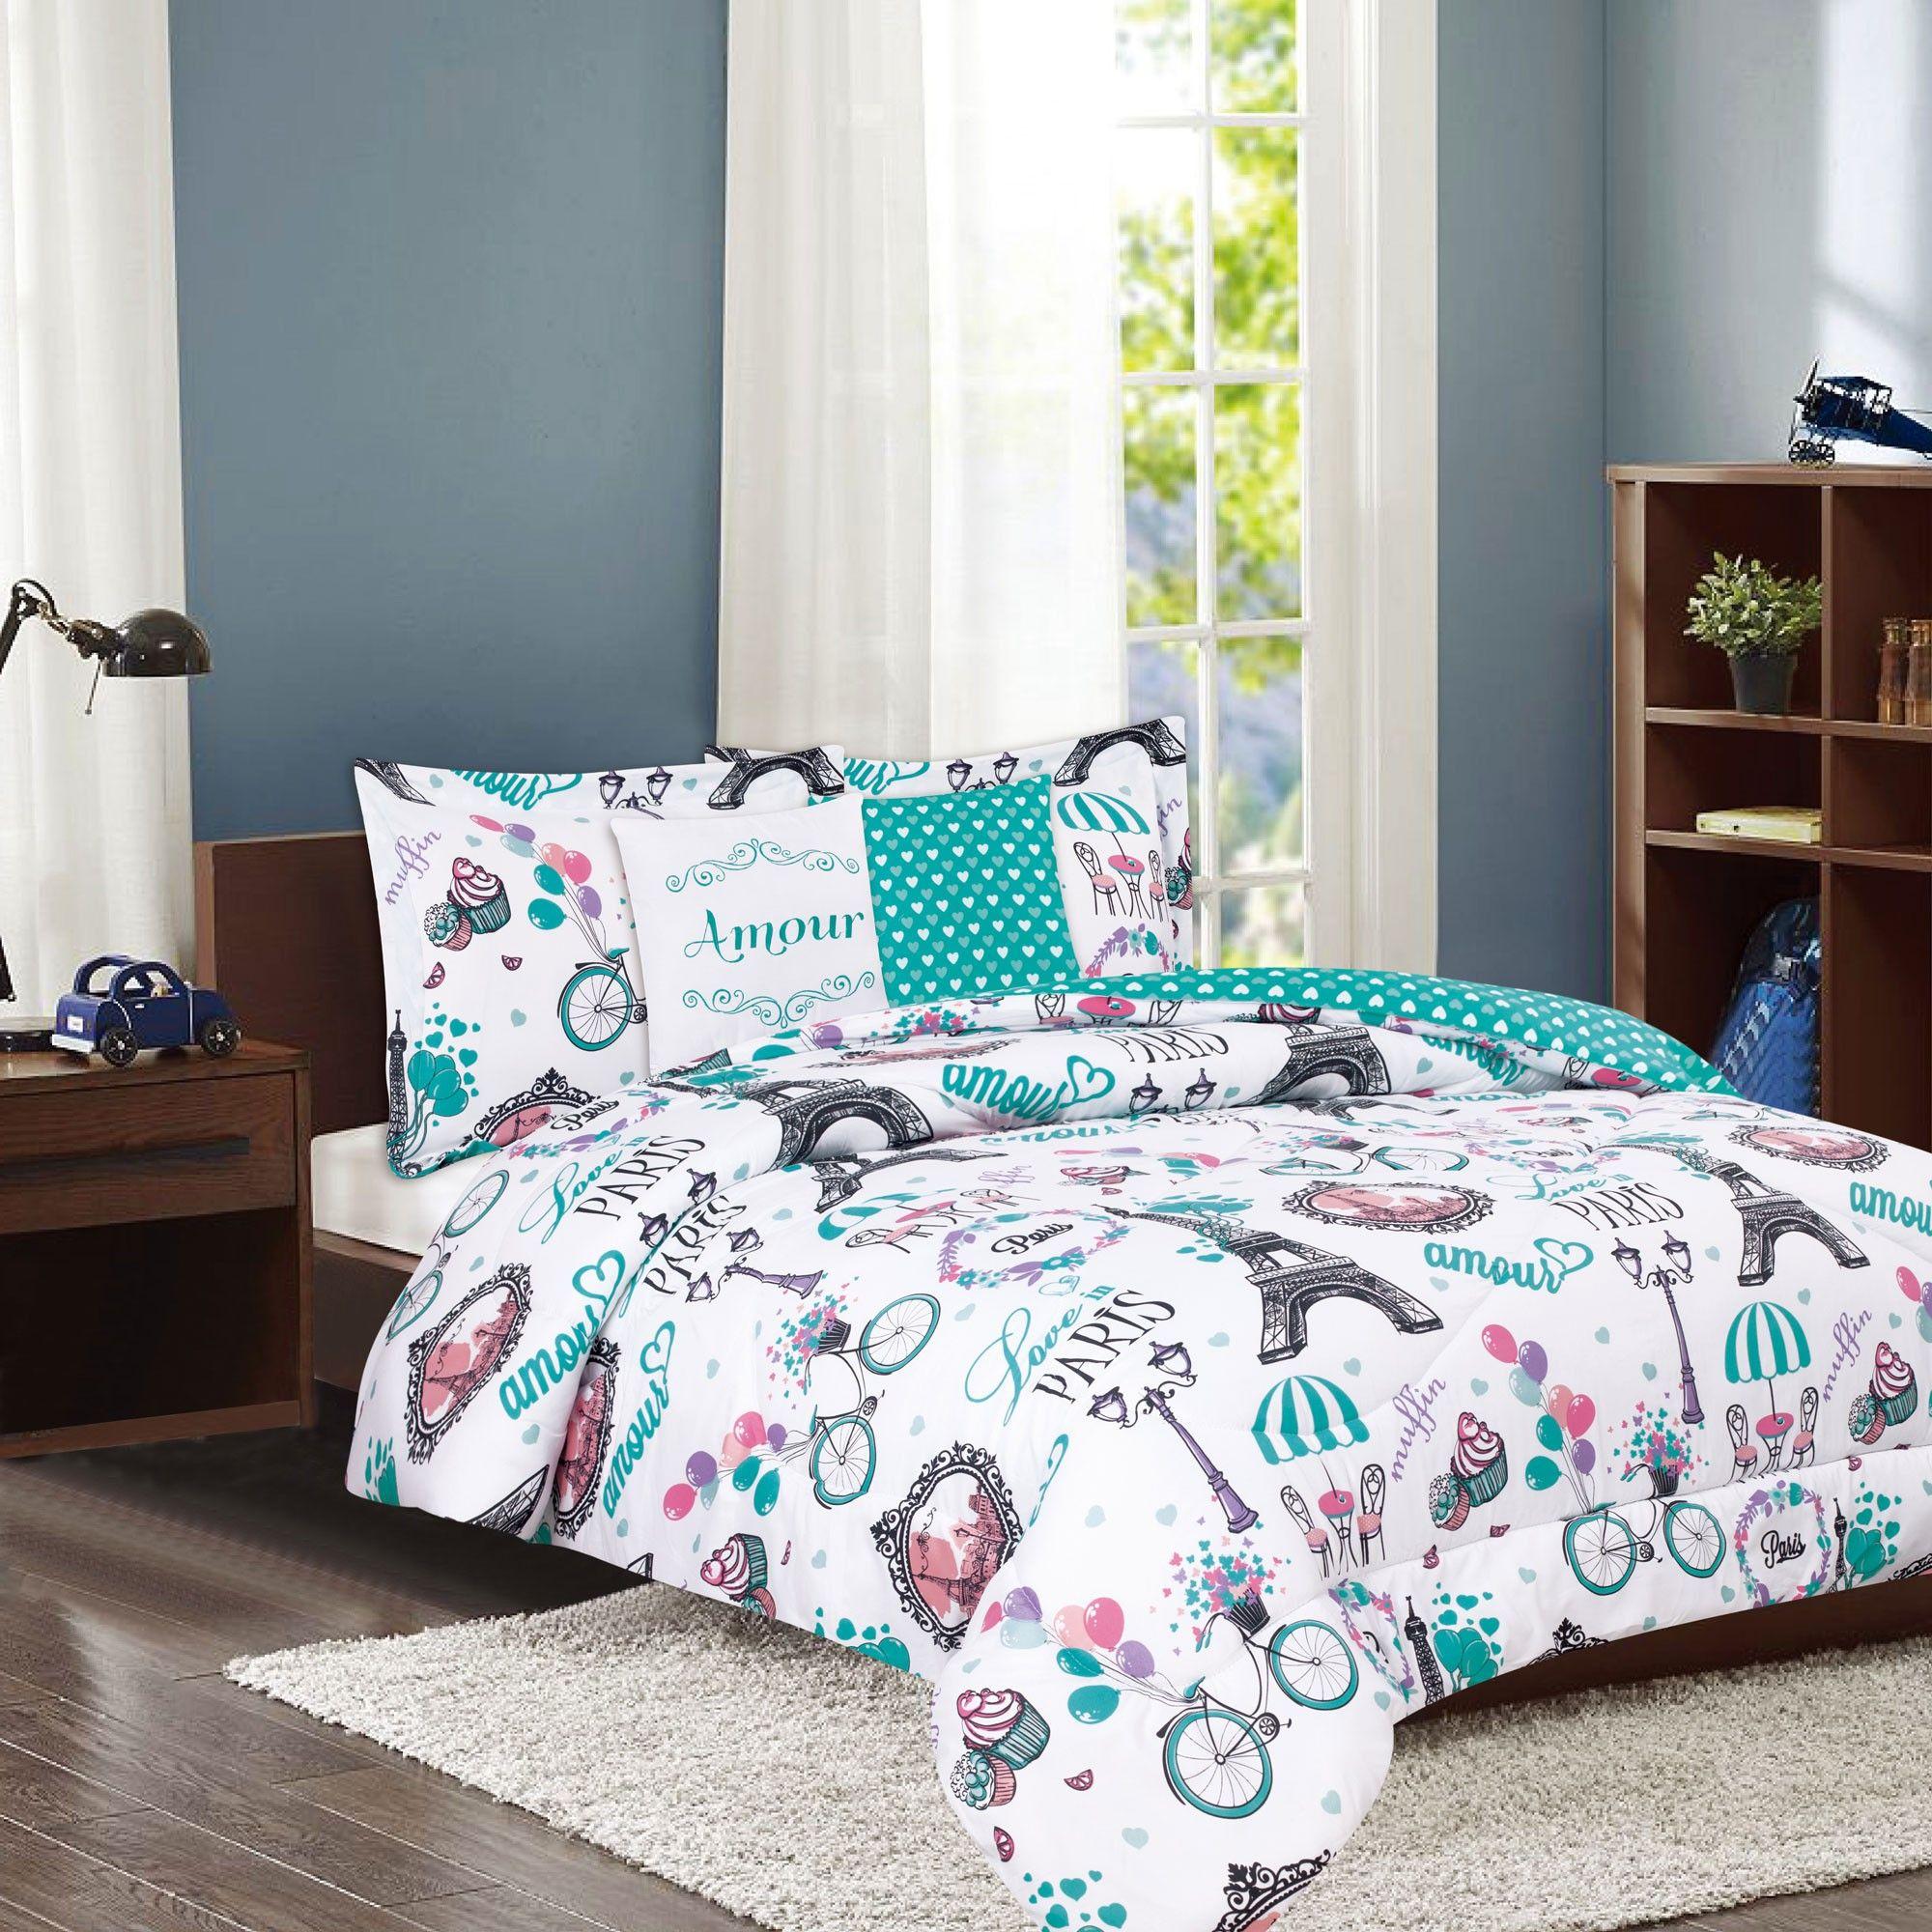 Crest Home Amour Twin Paris Comforter 4 Piece Bedding Set Teal